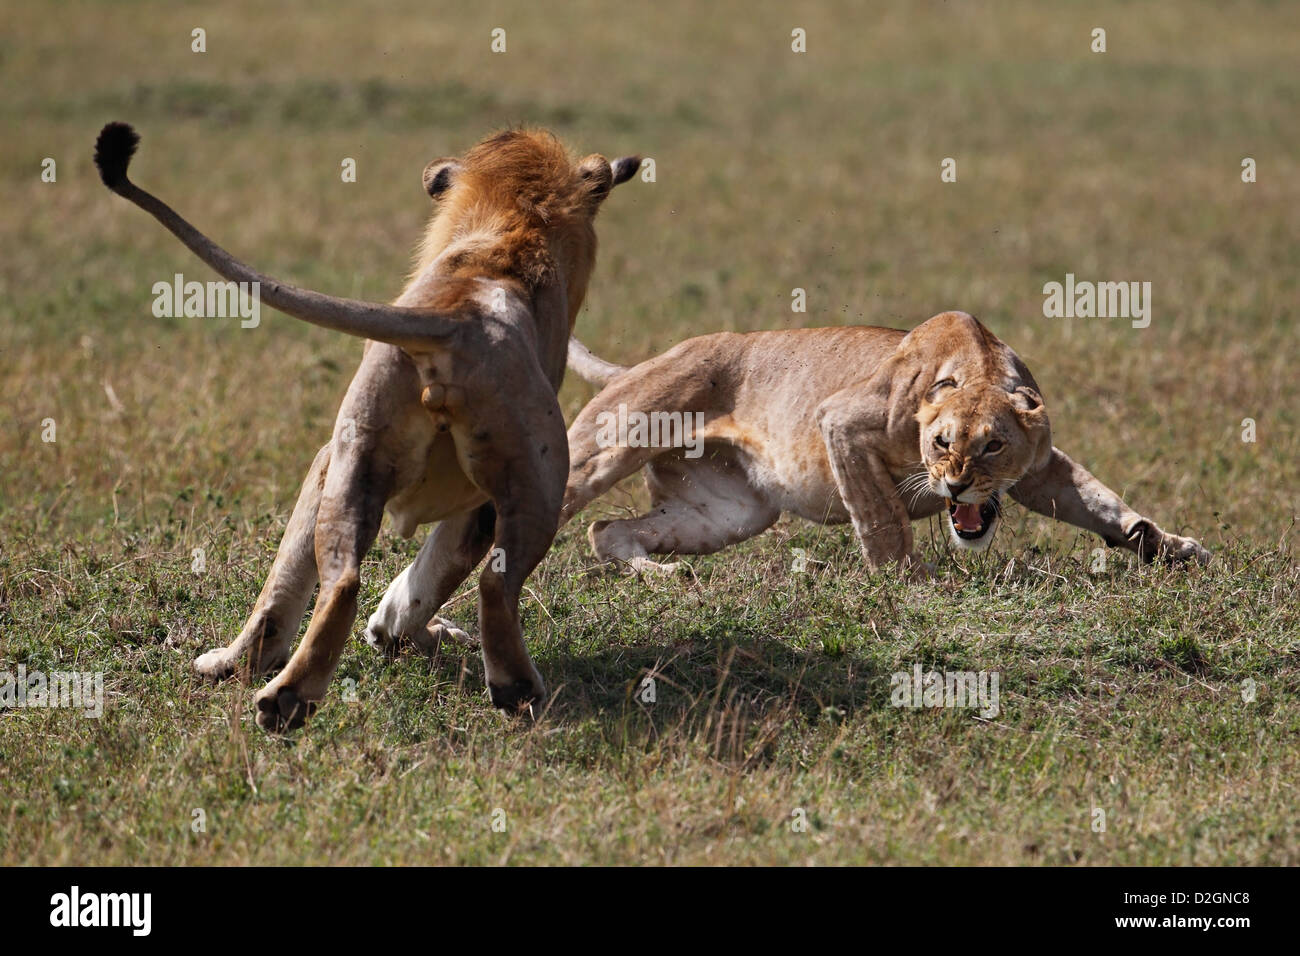 Fighting lions, agression, portrait. Kenya. - Stock Image